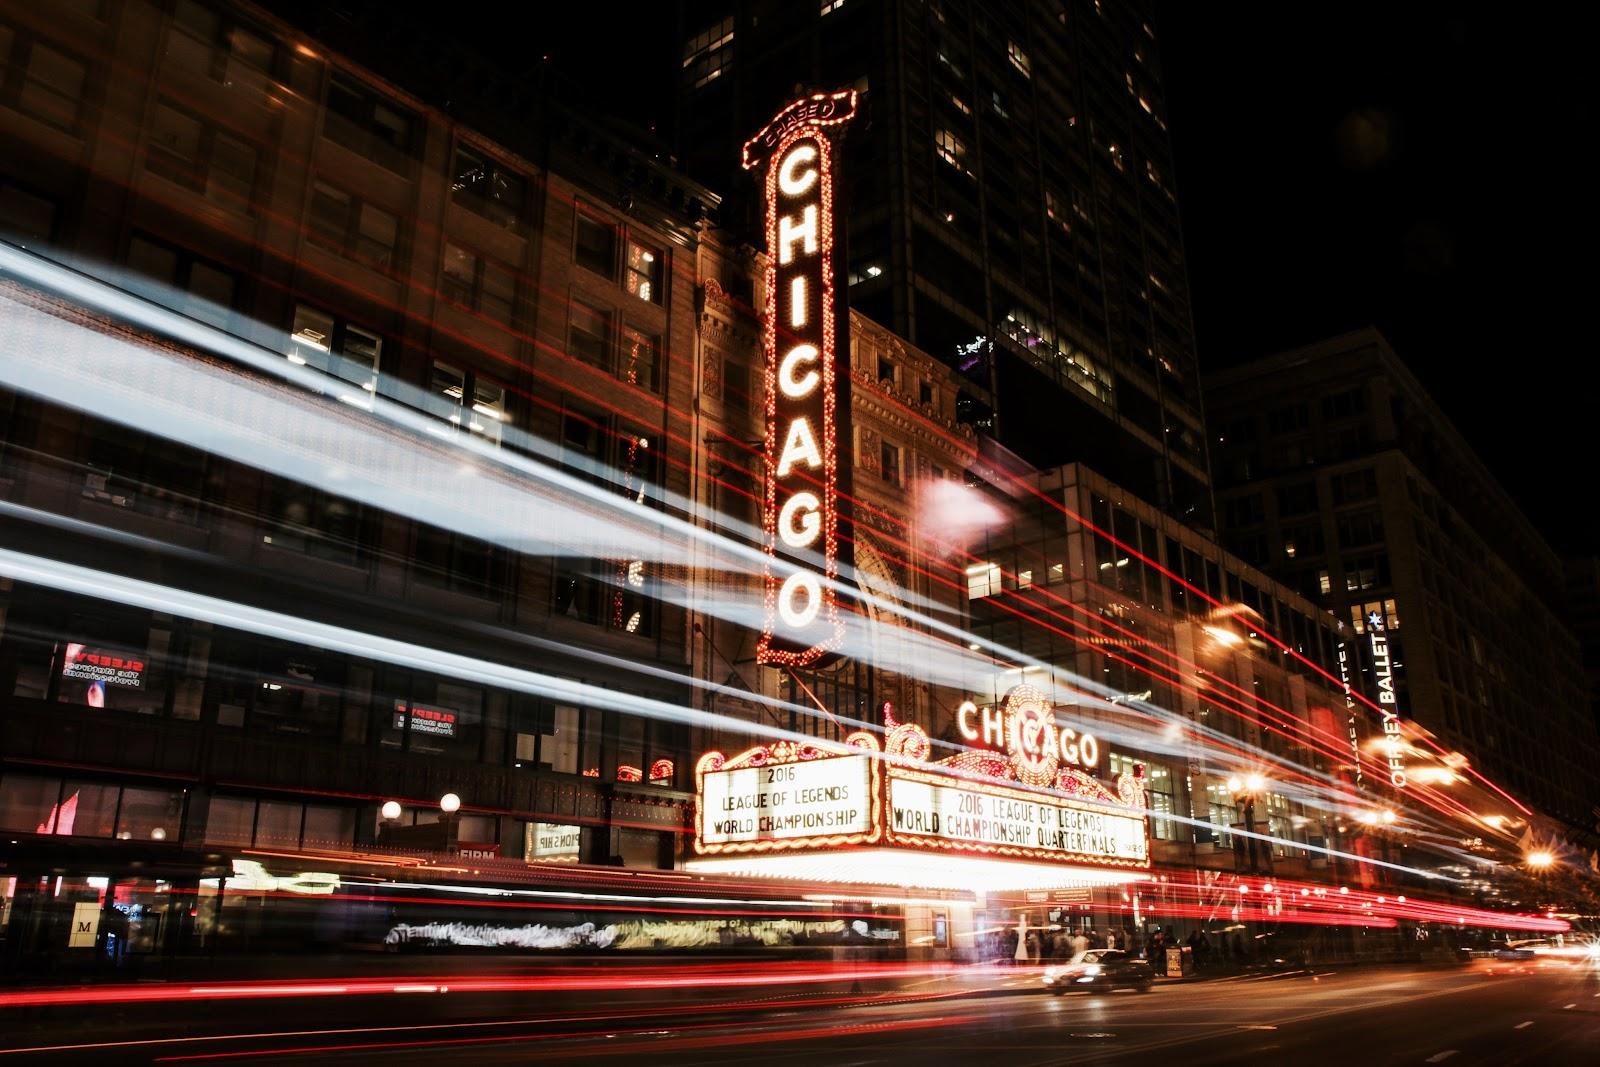 Chicago sign